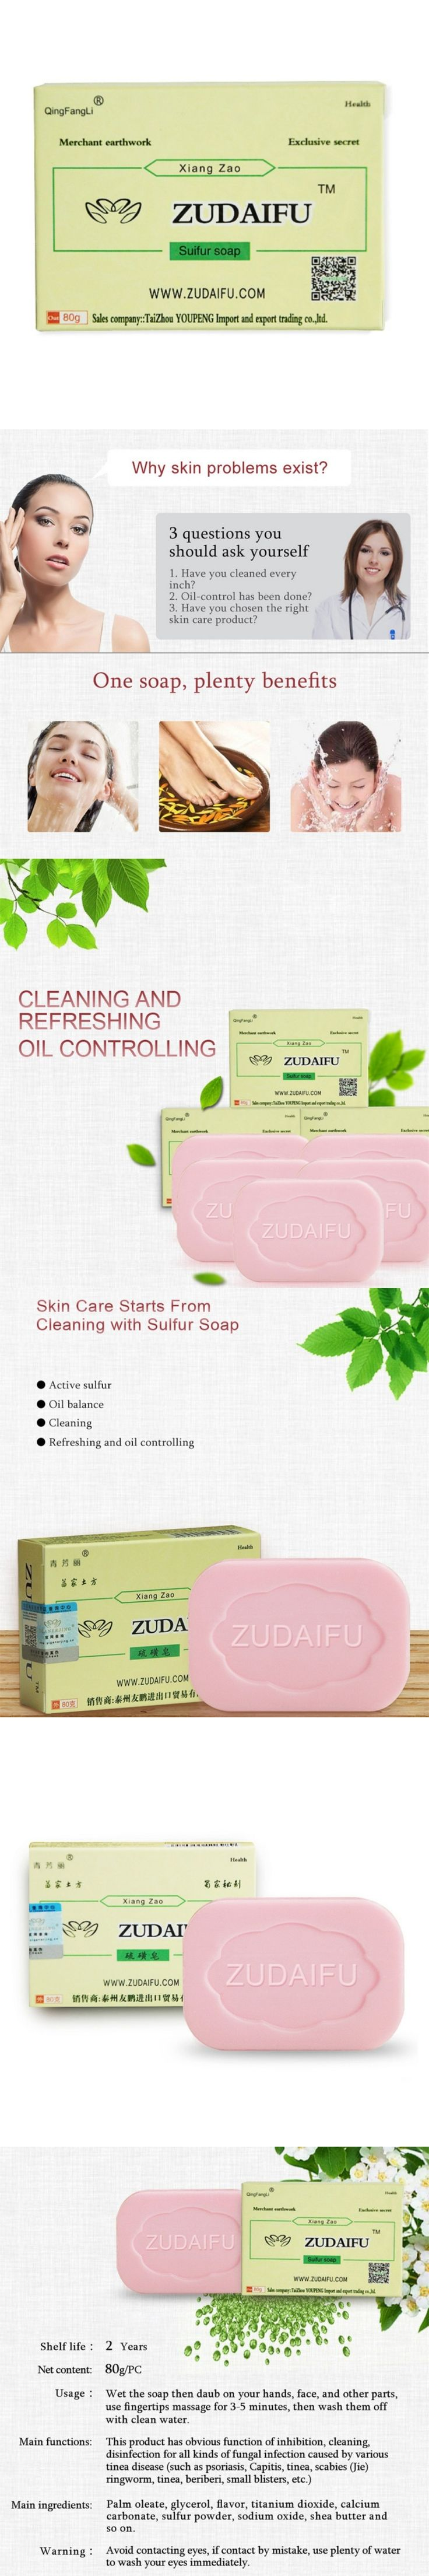 80g Sulfur Soap Skin Conditions Acne Psoriasis Seborrhea Eczema Anti Fungus Bath Healthy Body Soaps